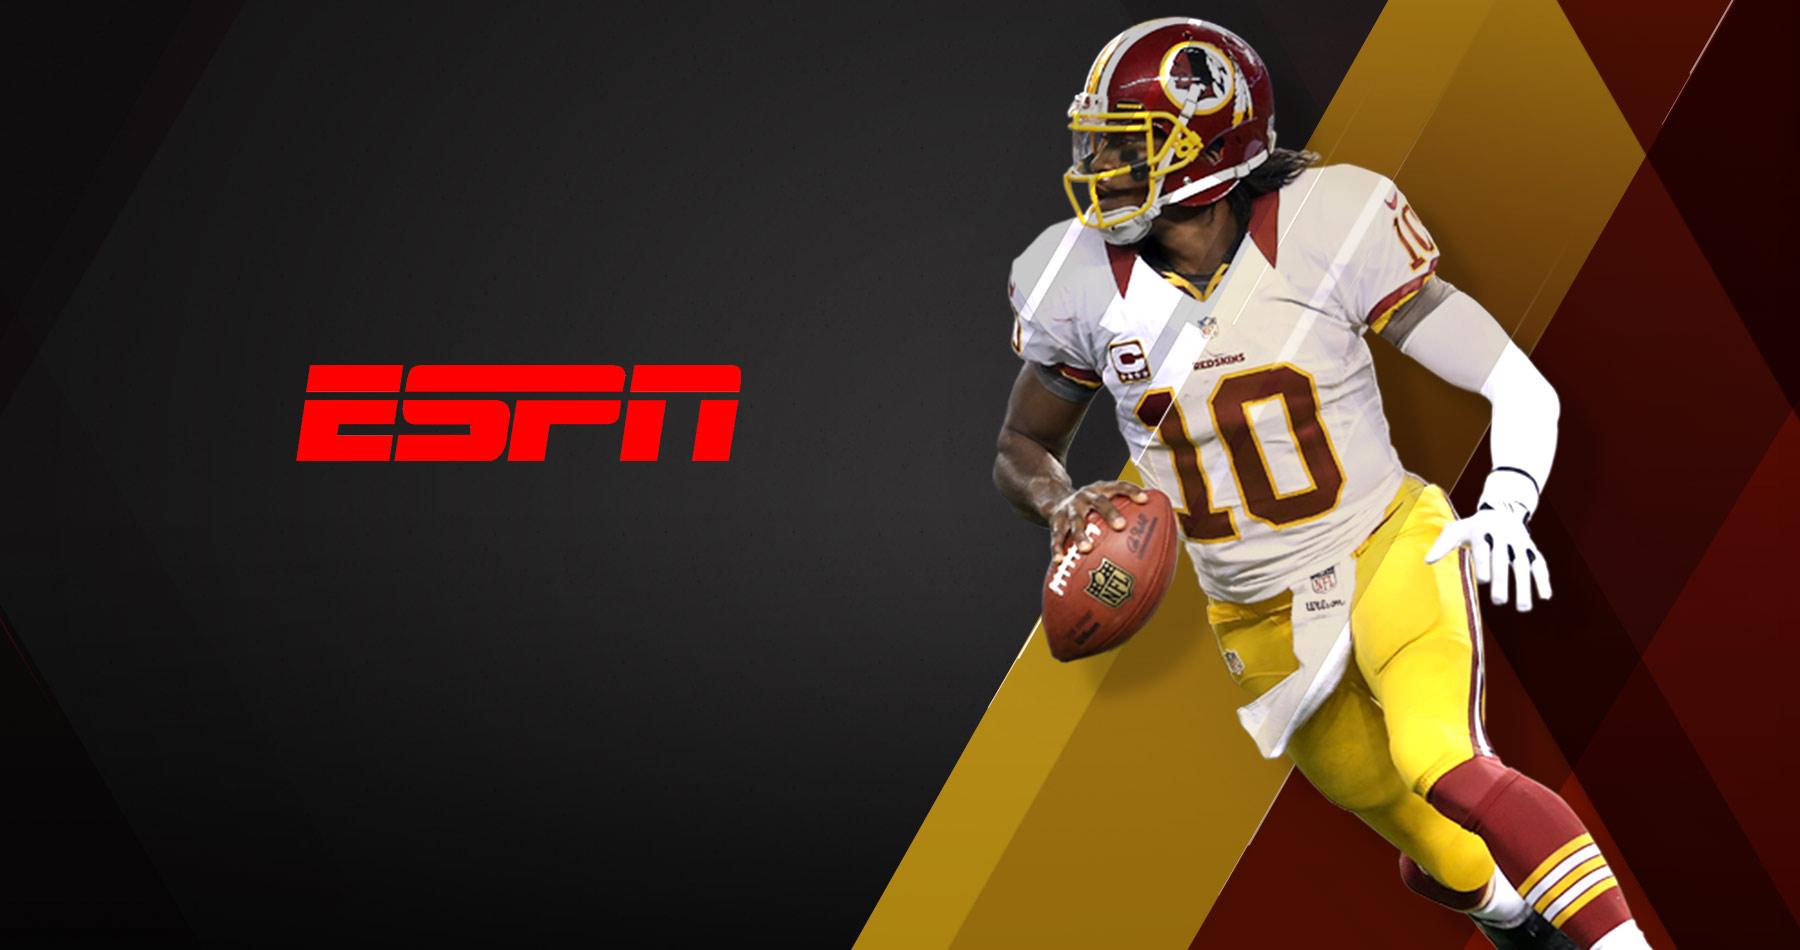 ESPN -  Sports Center Live